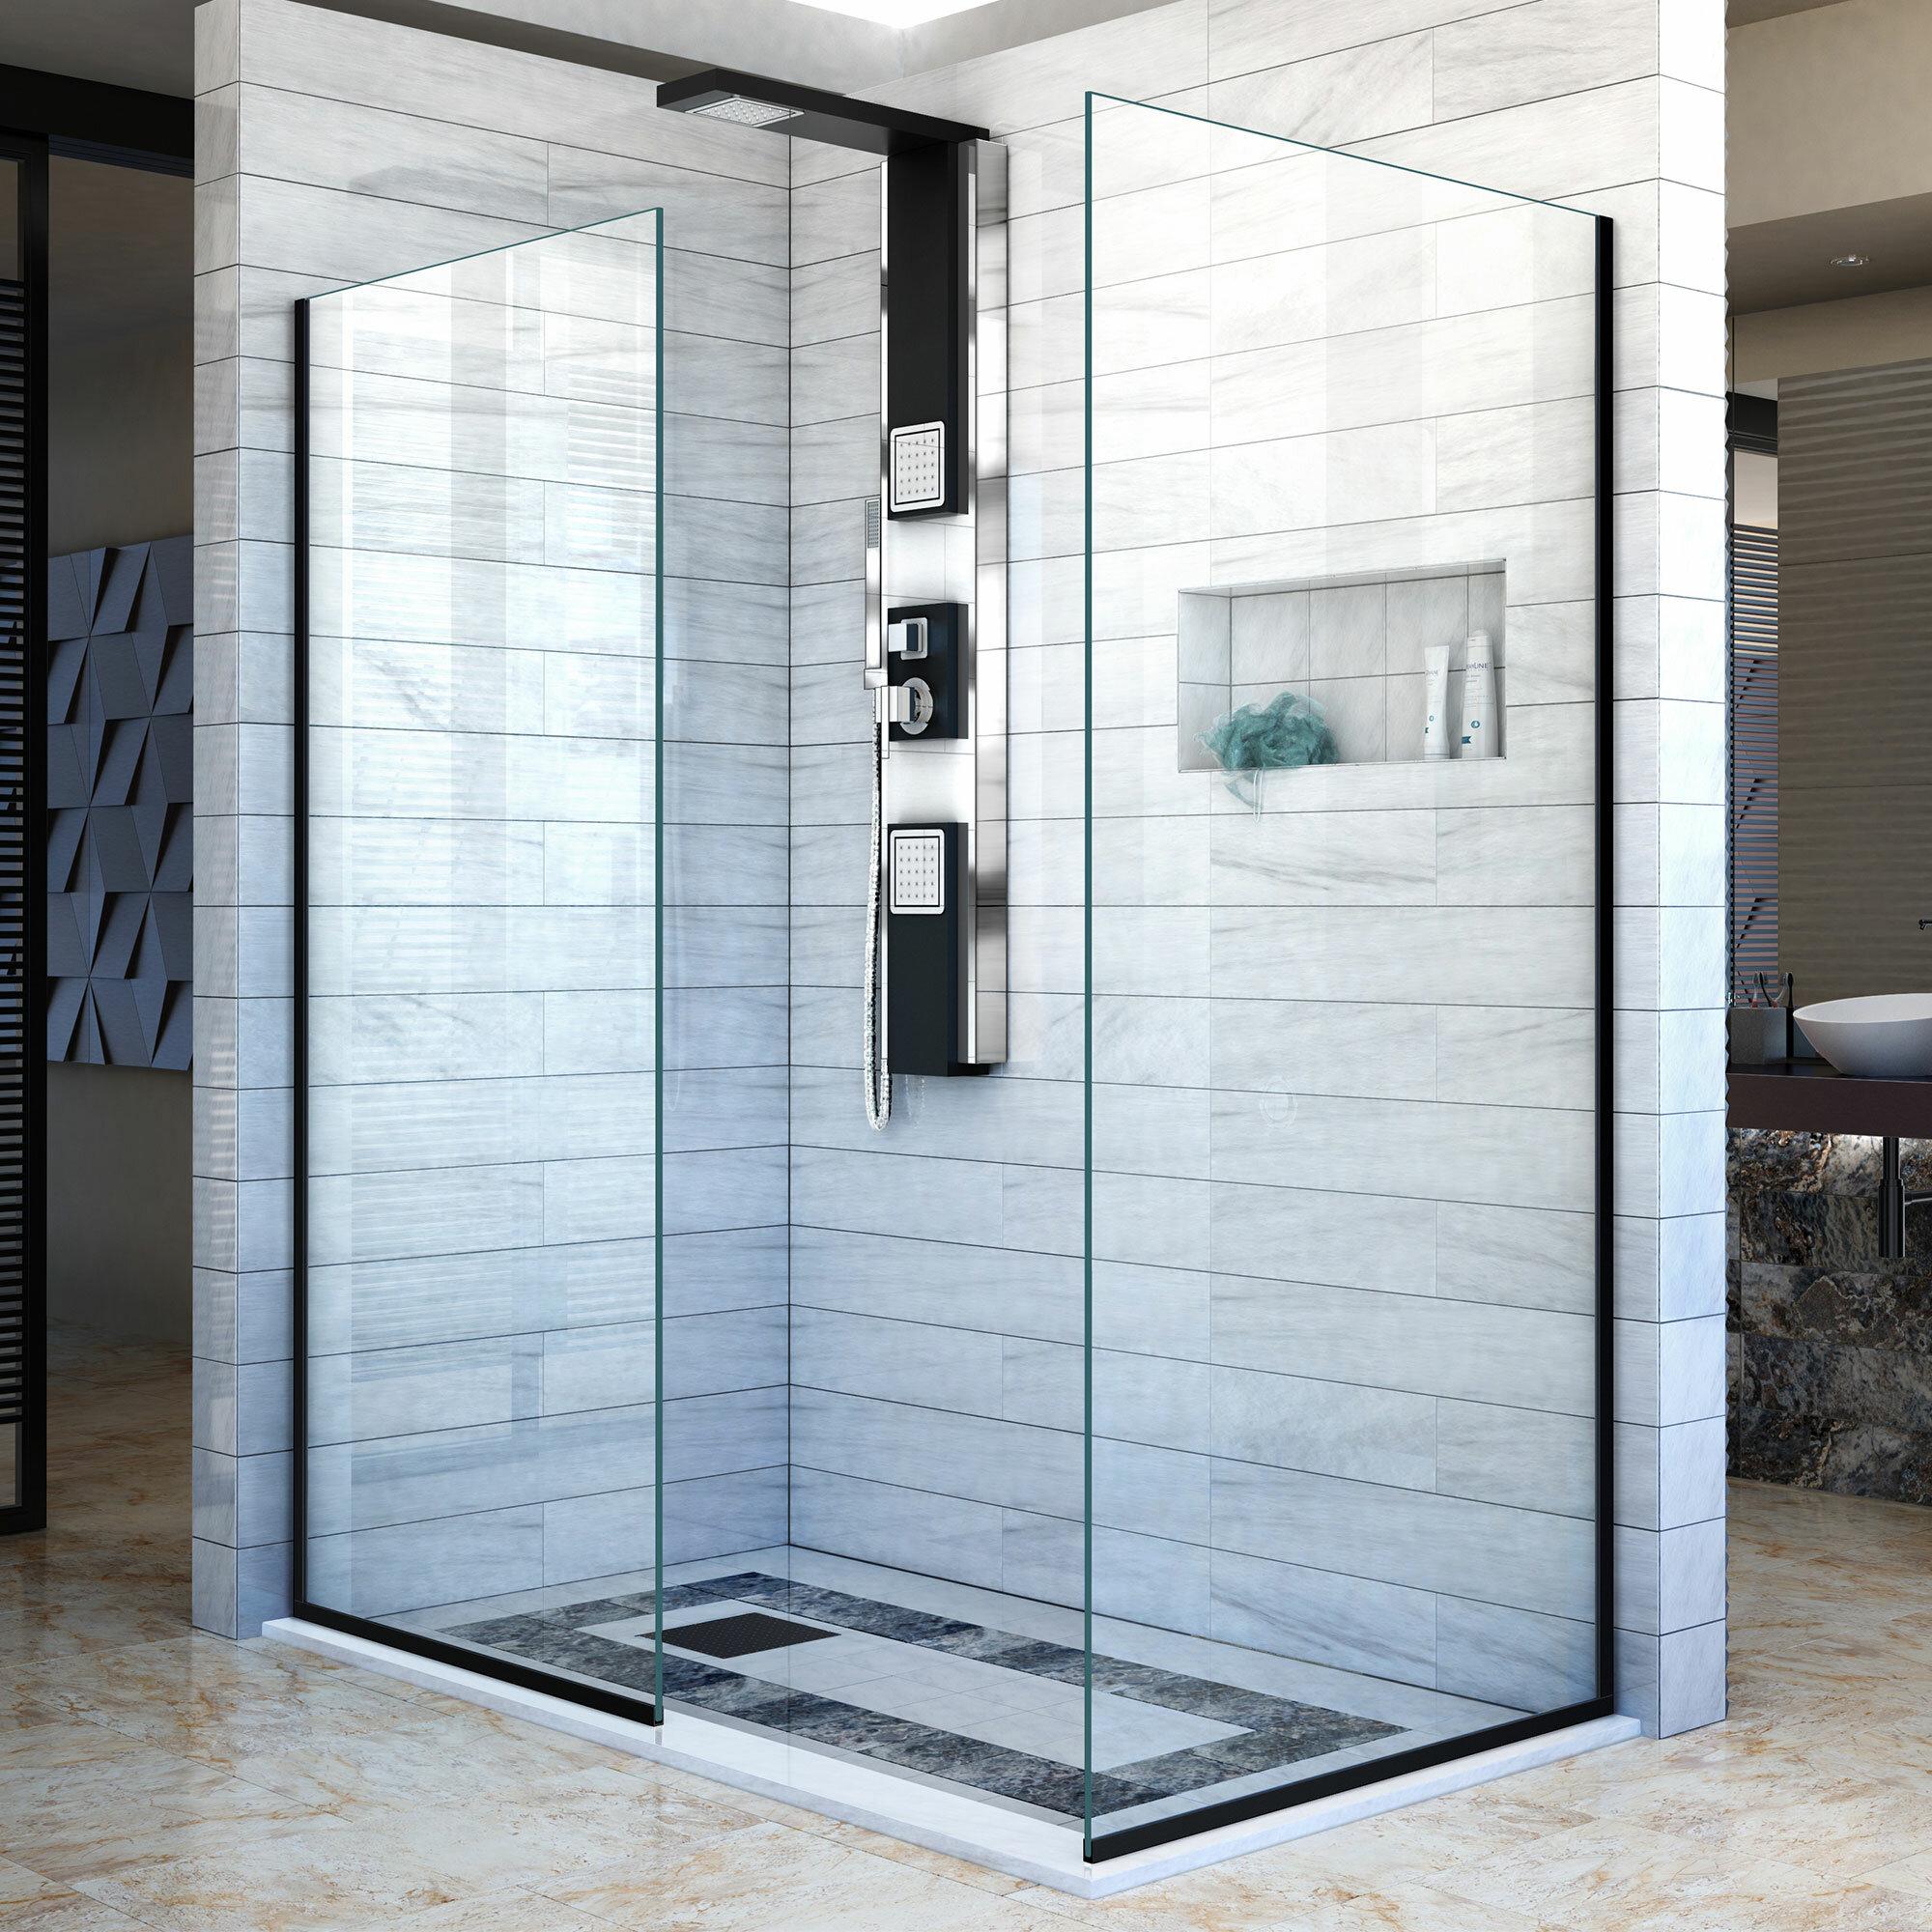 Linea 30 X 72 Semi Frameless Shower Door With Clearmax Technology